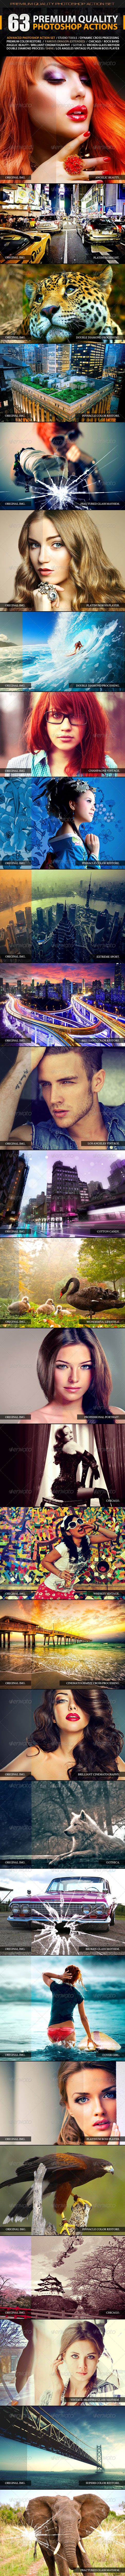 GraphicRiver 63 Premium Quality Photoshop Actions 7398265